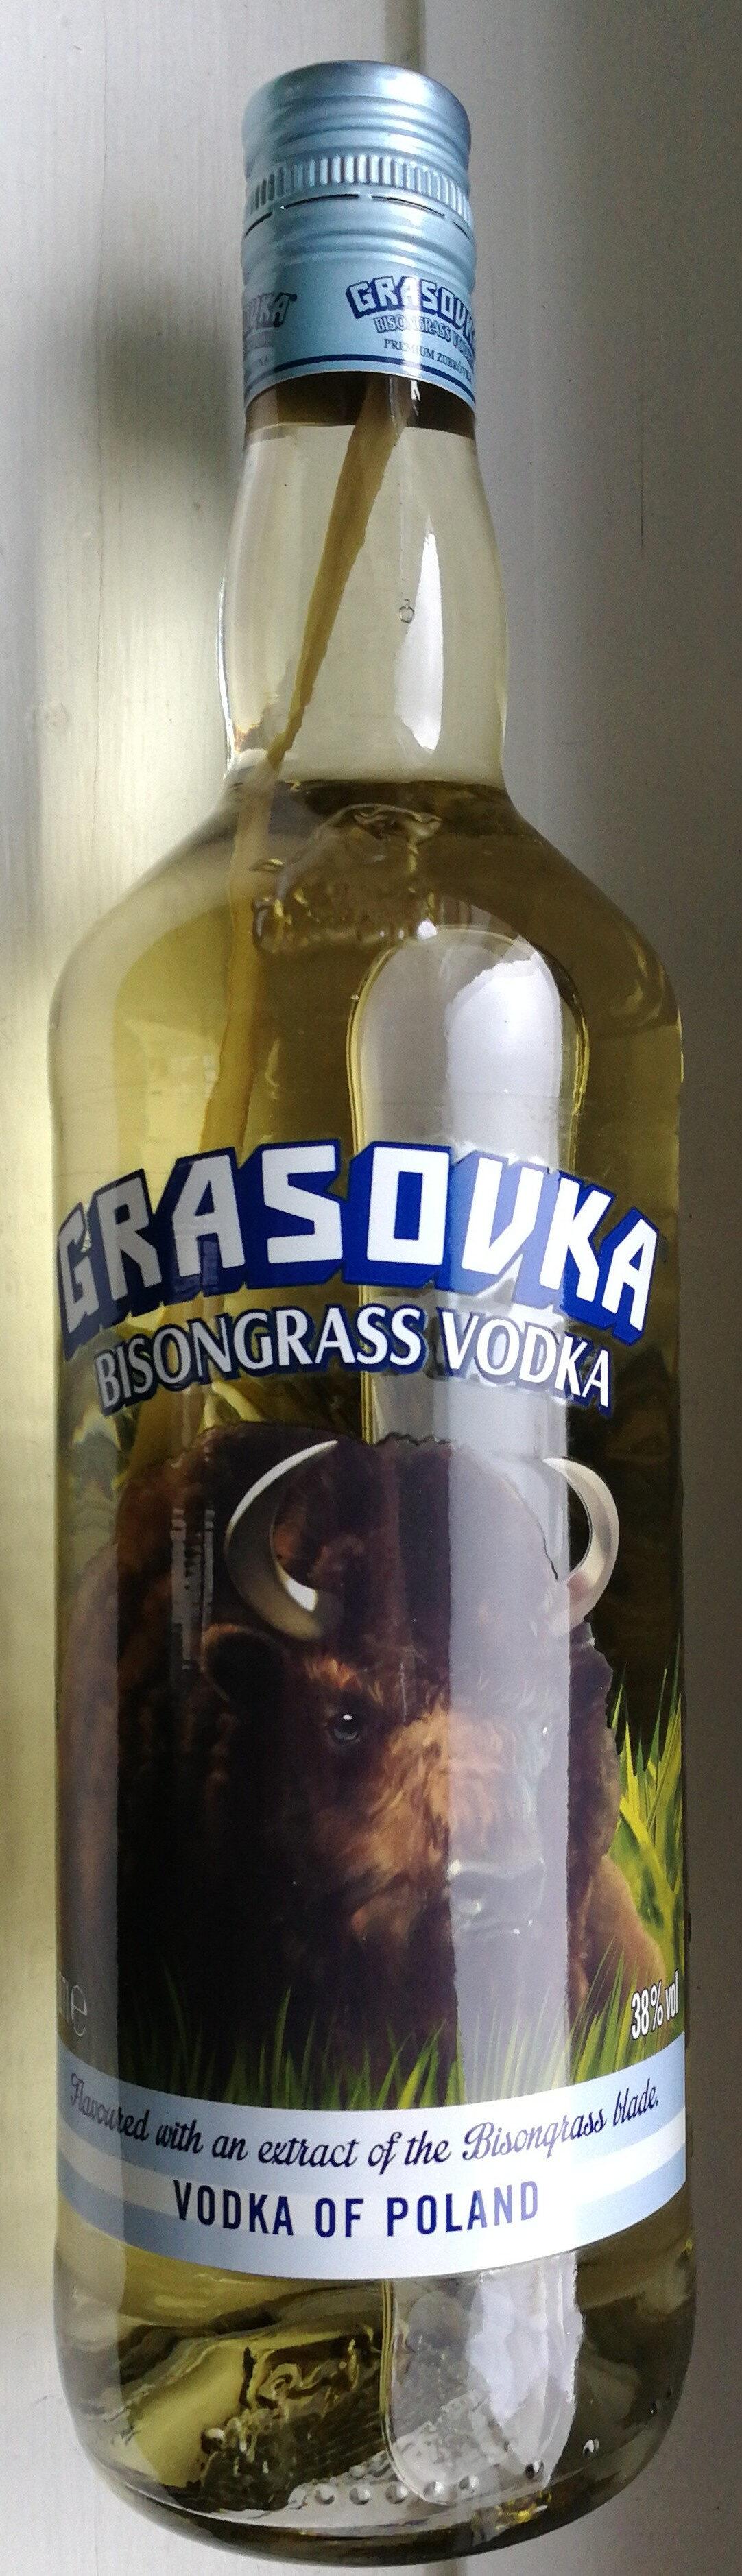 GRASOVKA - BISONGRAS VODKA - Produit - de